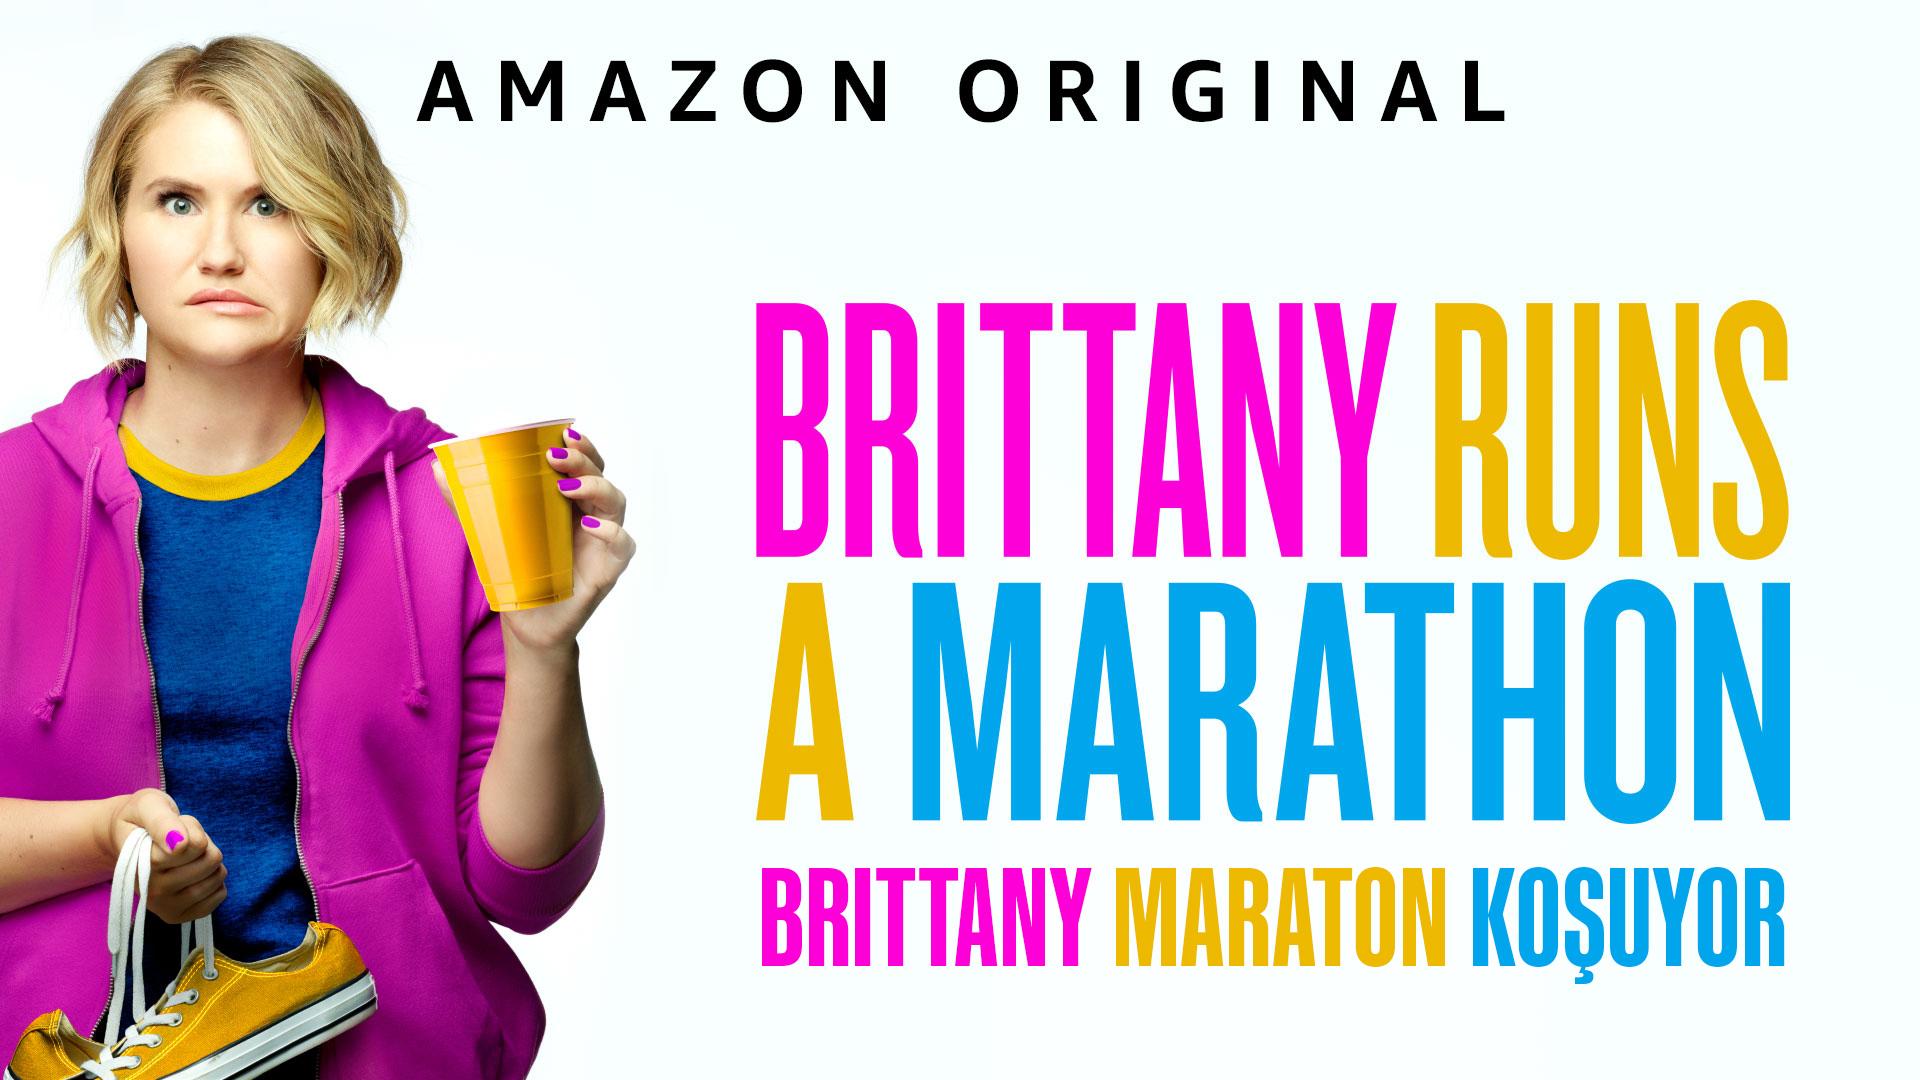 Brittany Maraton Koşuyor